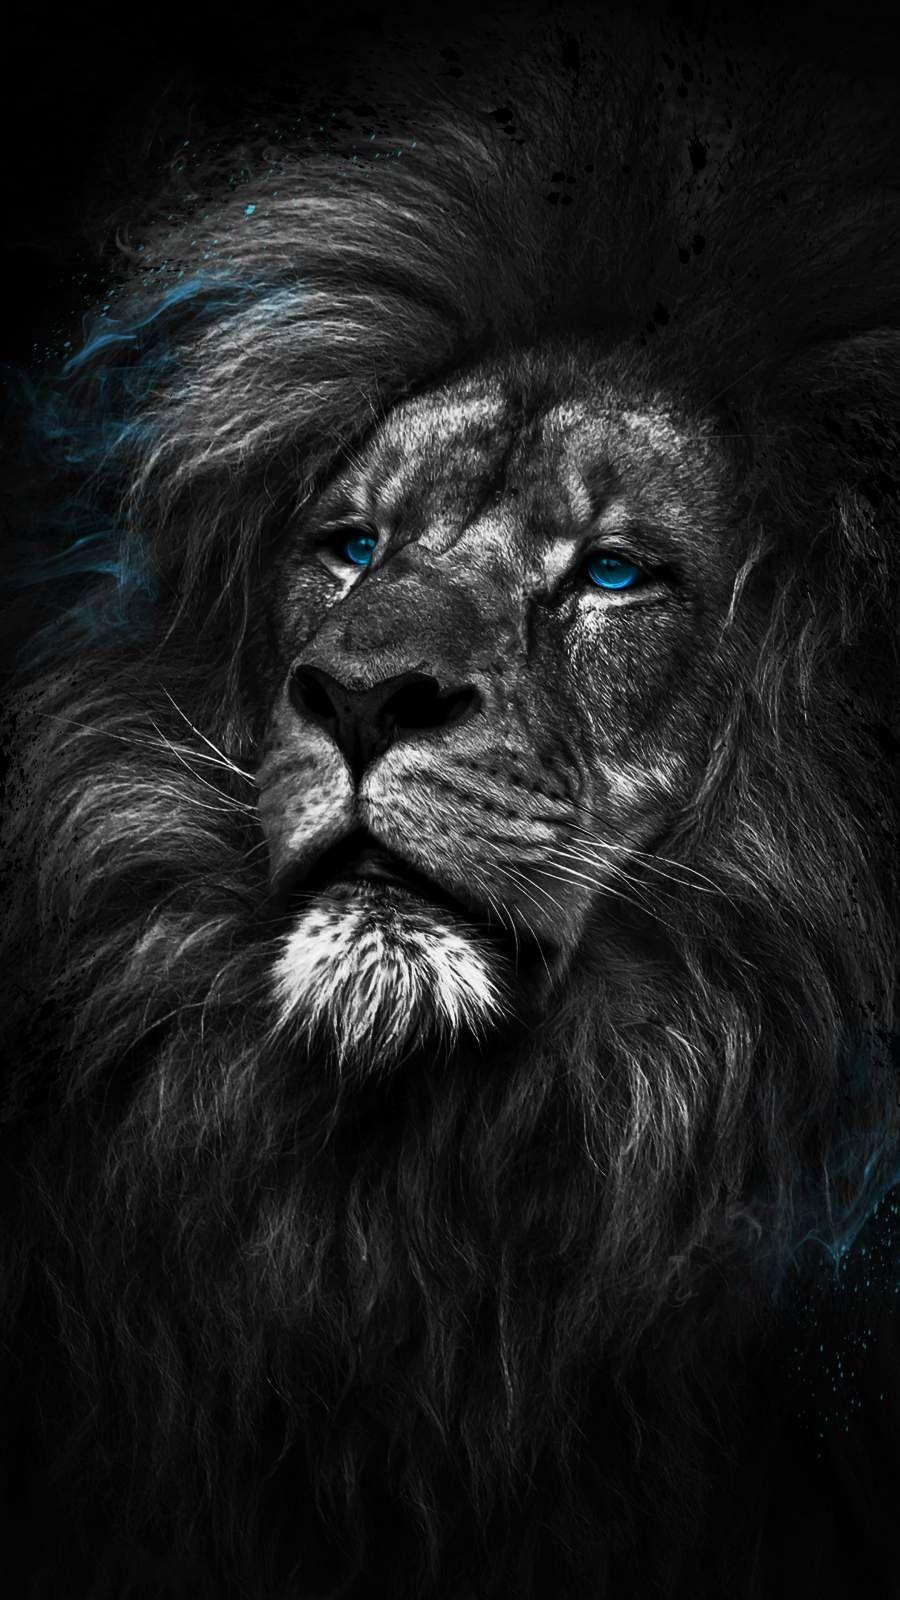 King Of The Jungle Iphone Wallpaper Lion Hd Wallpaper Lion Wallpaper Iphone Lion Wallpaper Iphone full hd black lion wallpaper